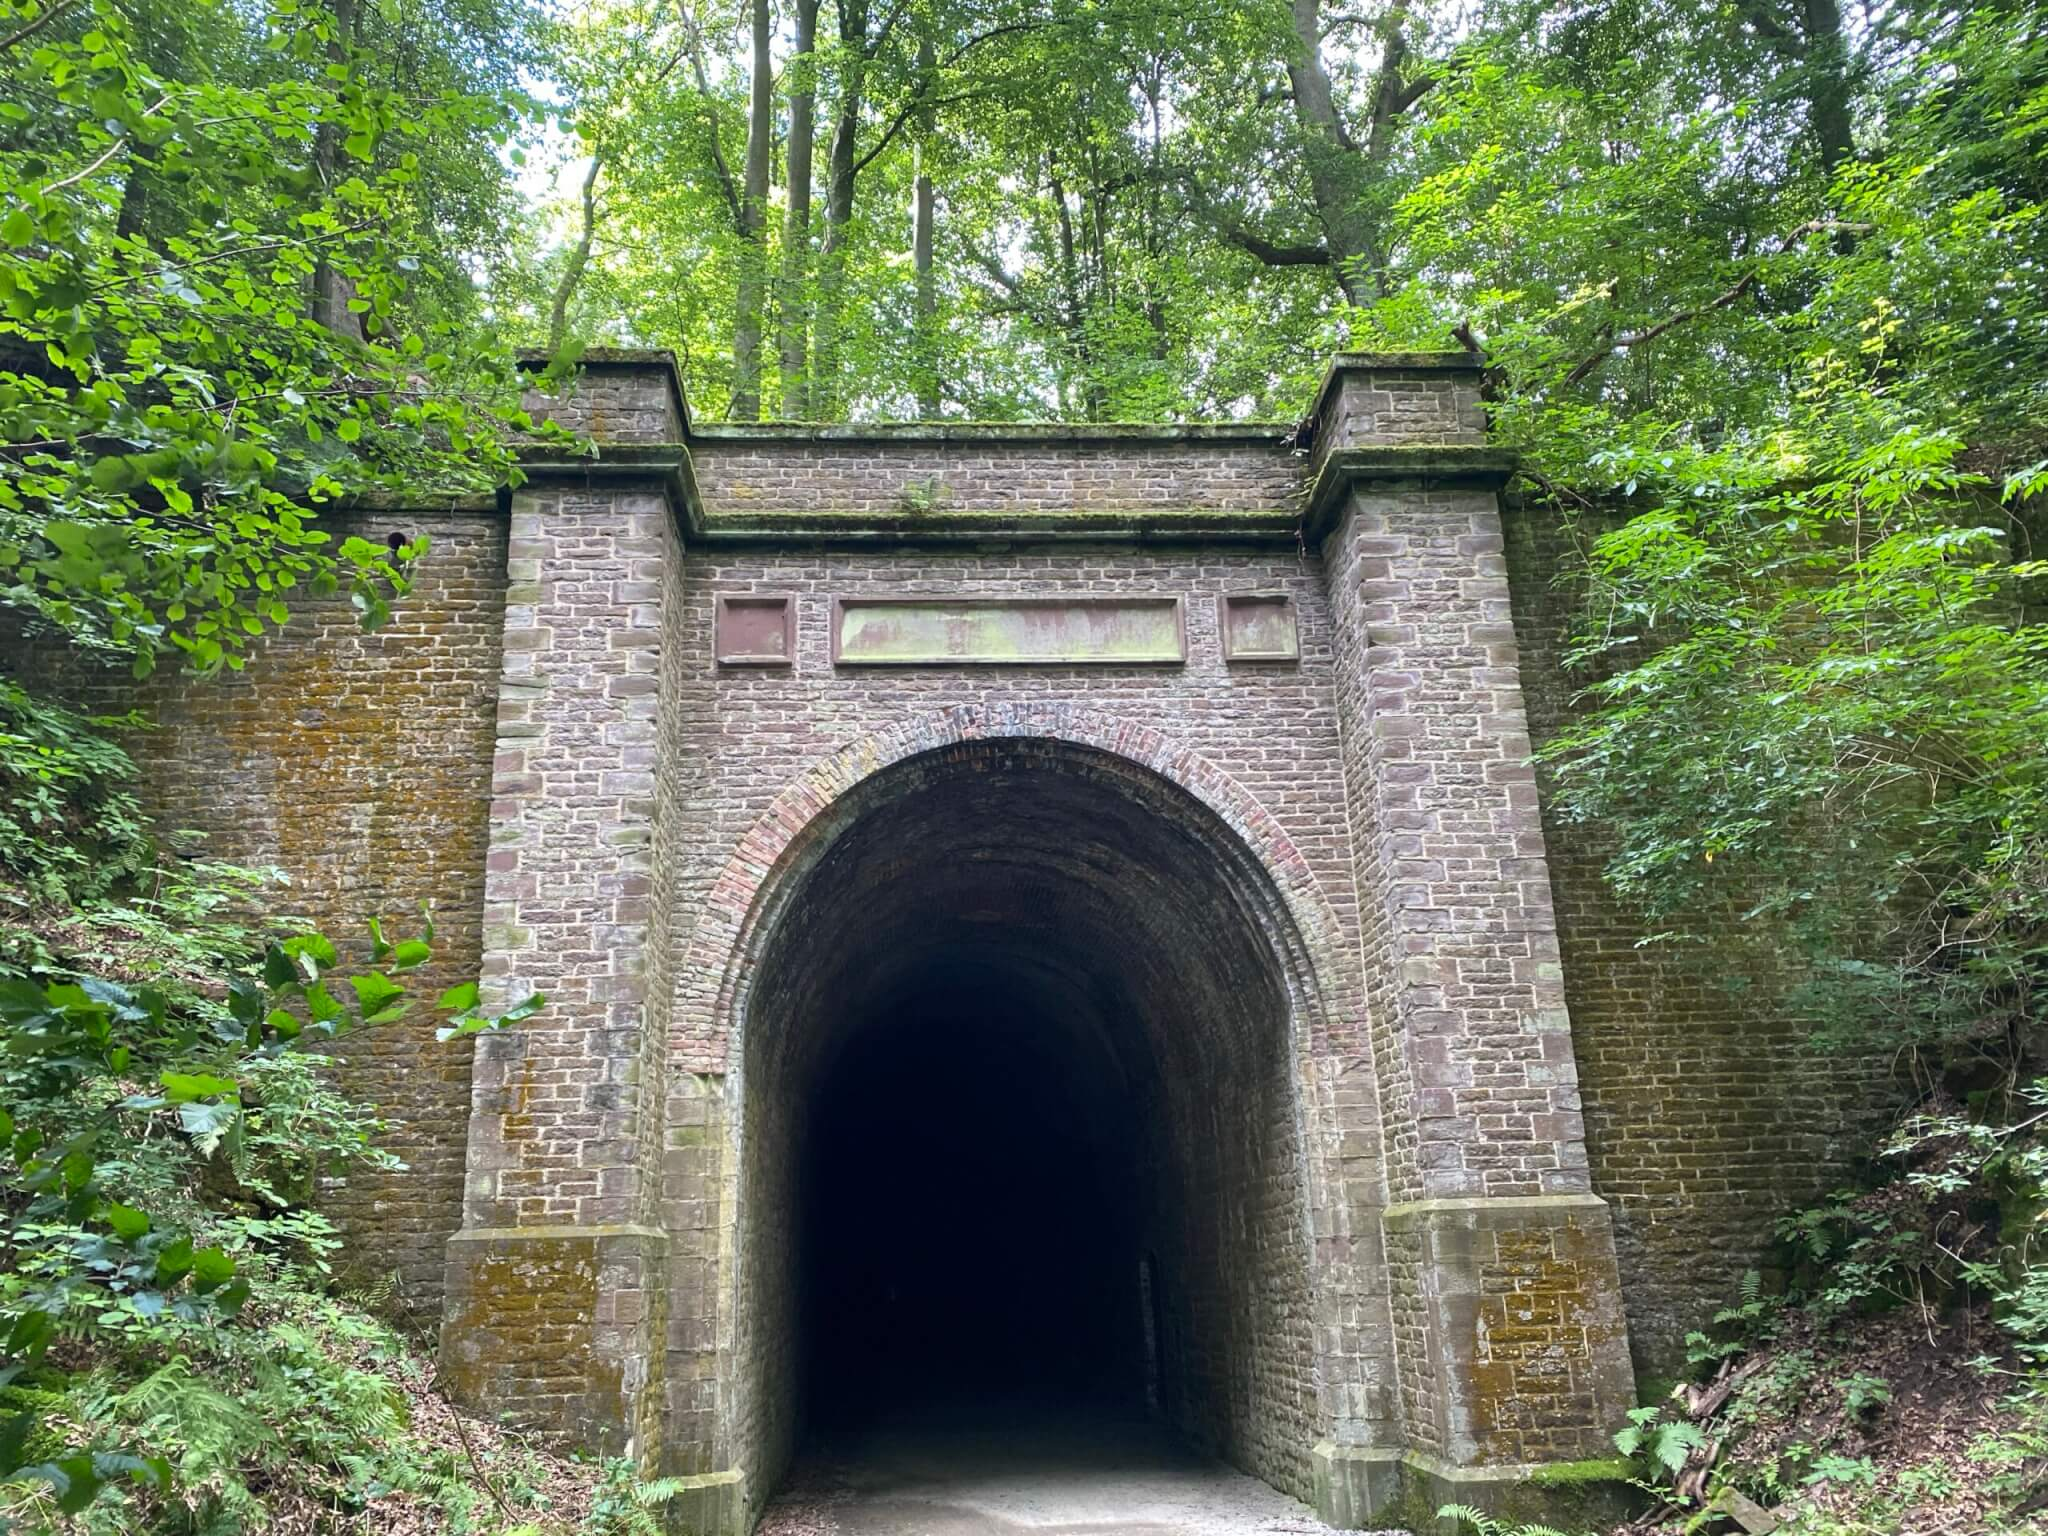 Northern portal of Carlsbahn-Tunnel/Deiseler Tunnel, Trendelburg